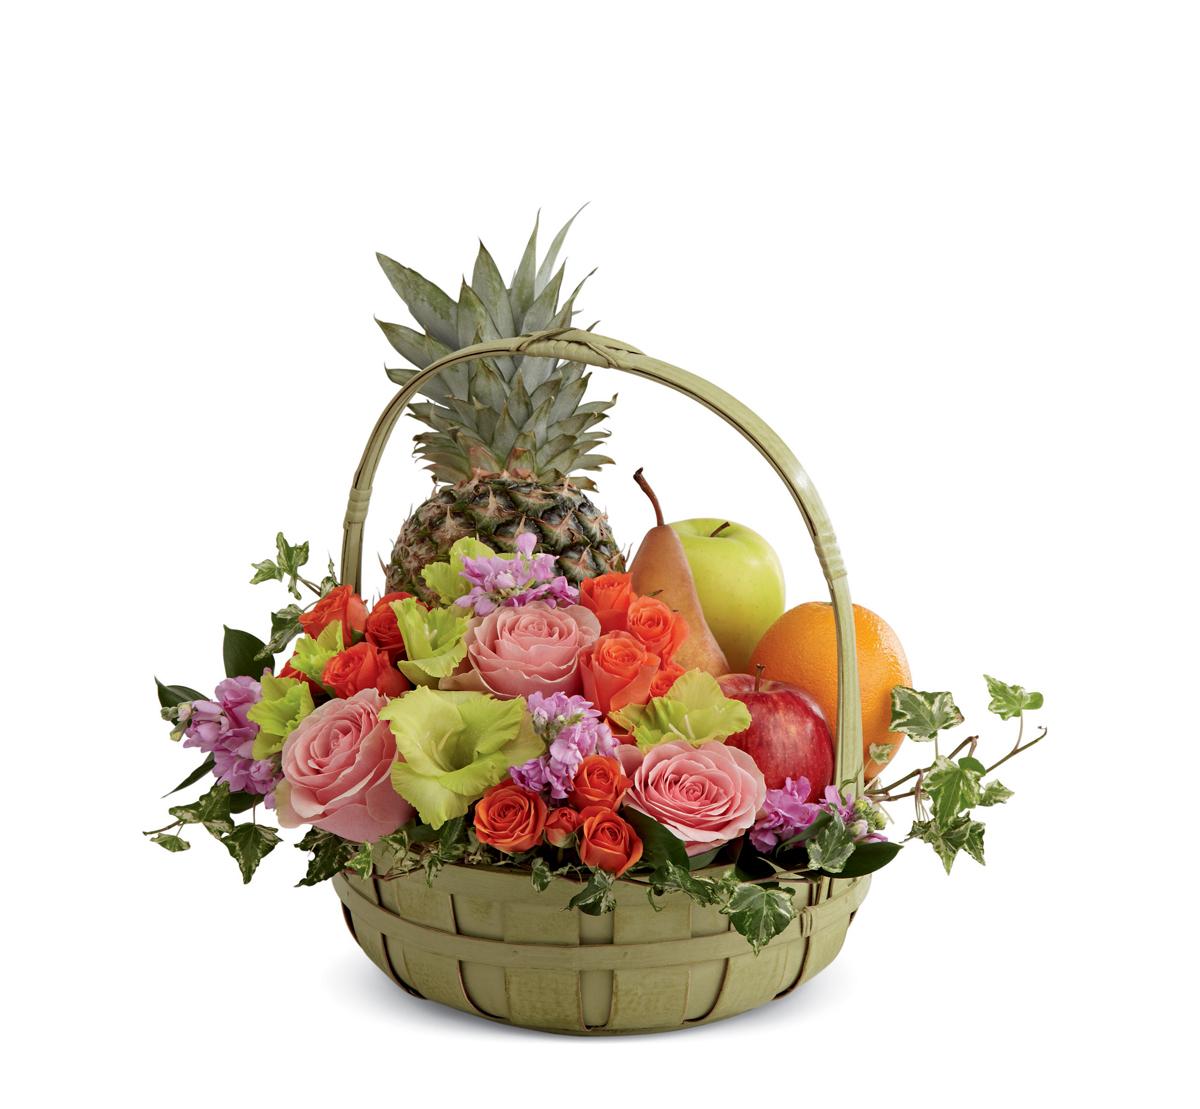 The Ftd Rest In Peace Sympathy Altamonte Springs Fl Florist